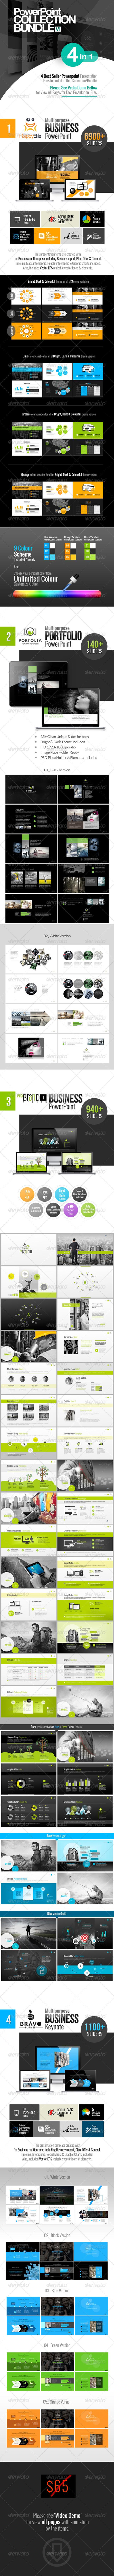 GraphicRiver Powerpoint Collection Bundle VI 7790036